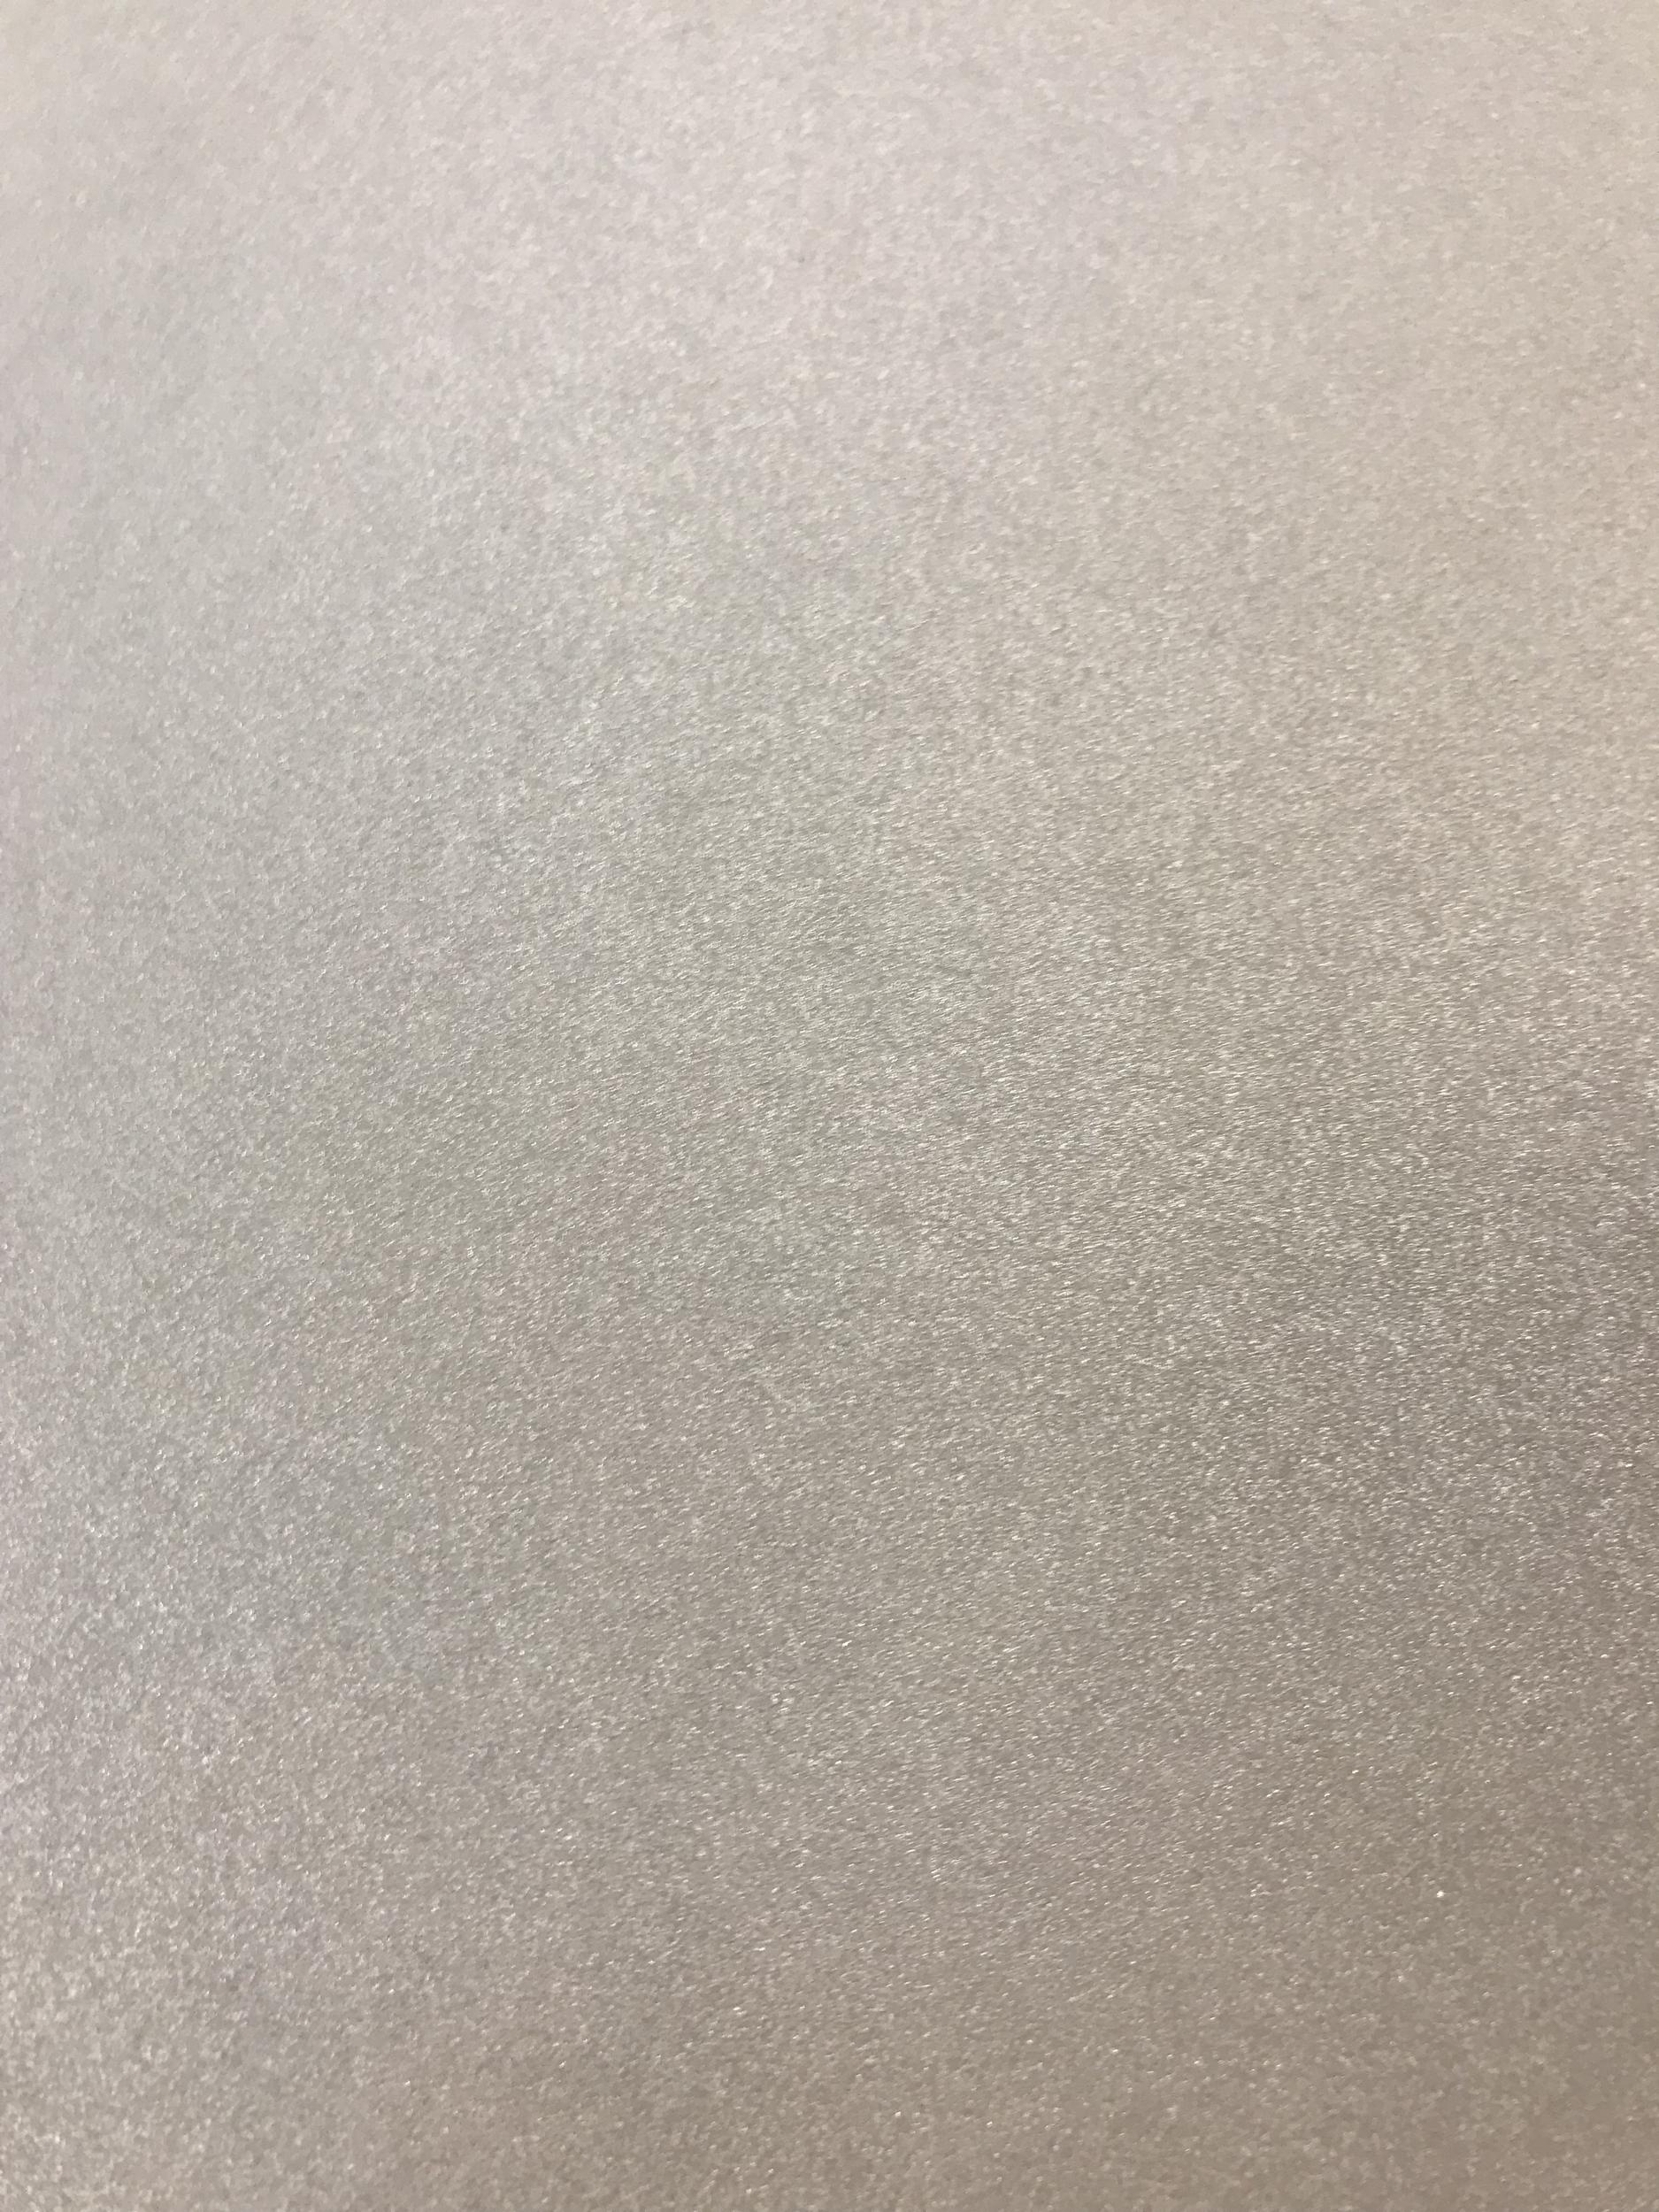 11461114(1)